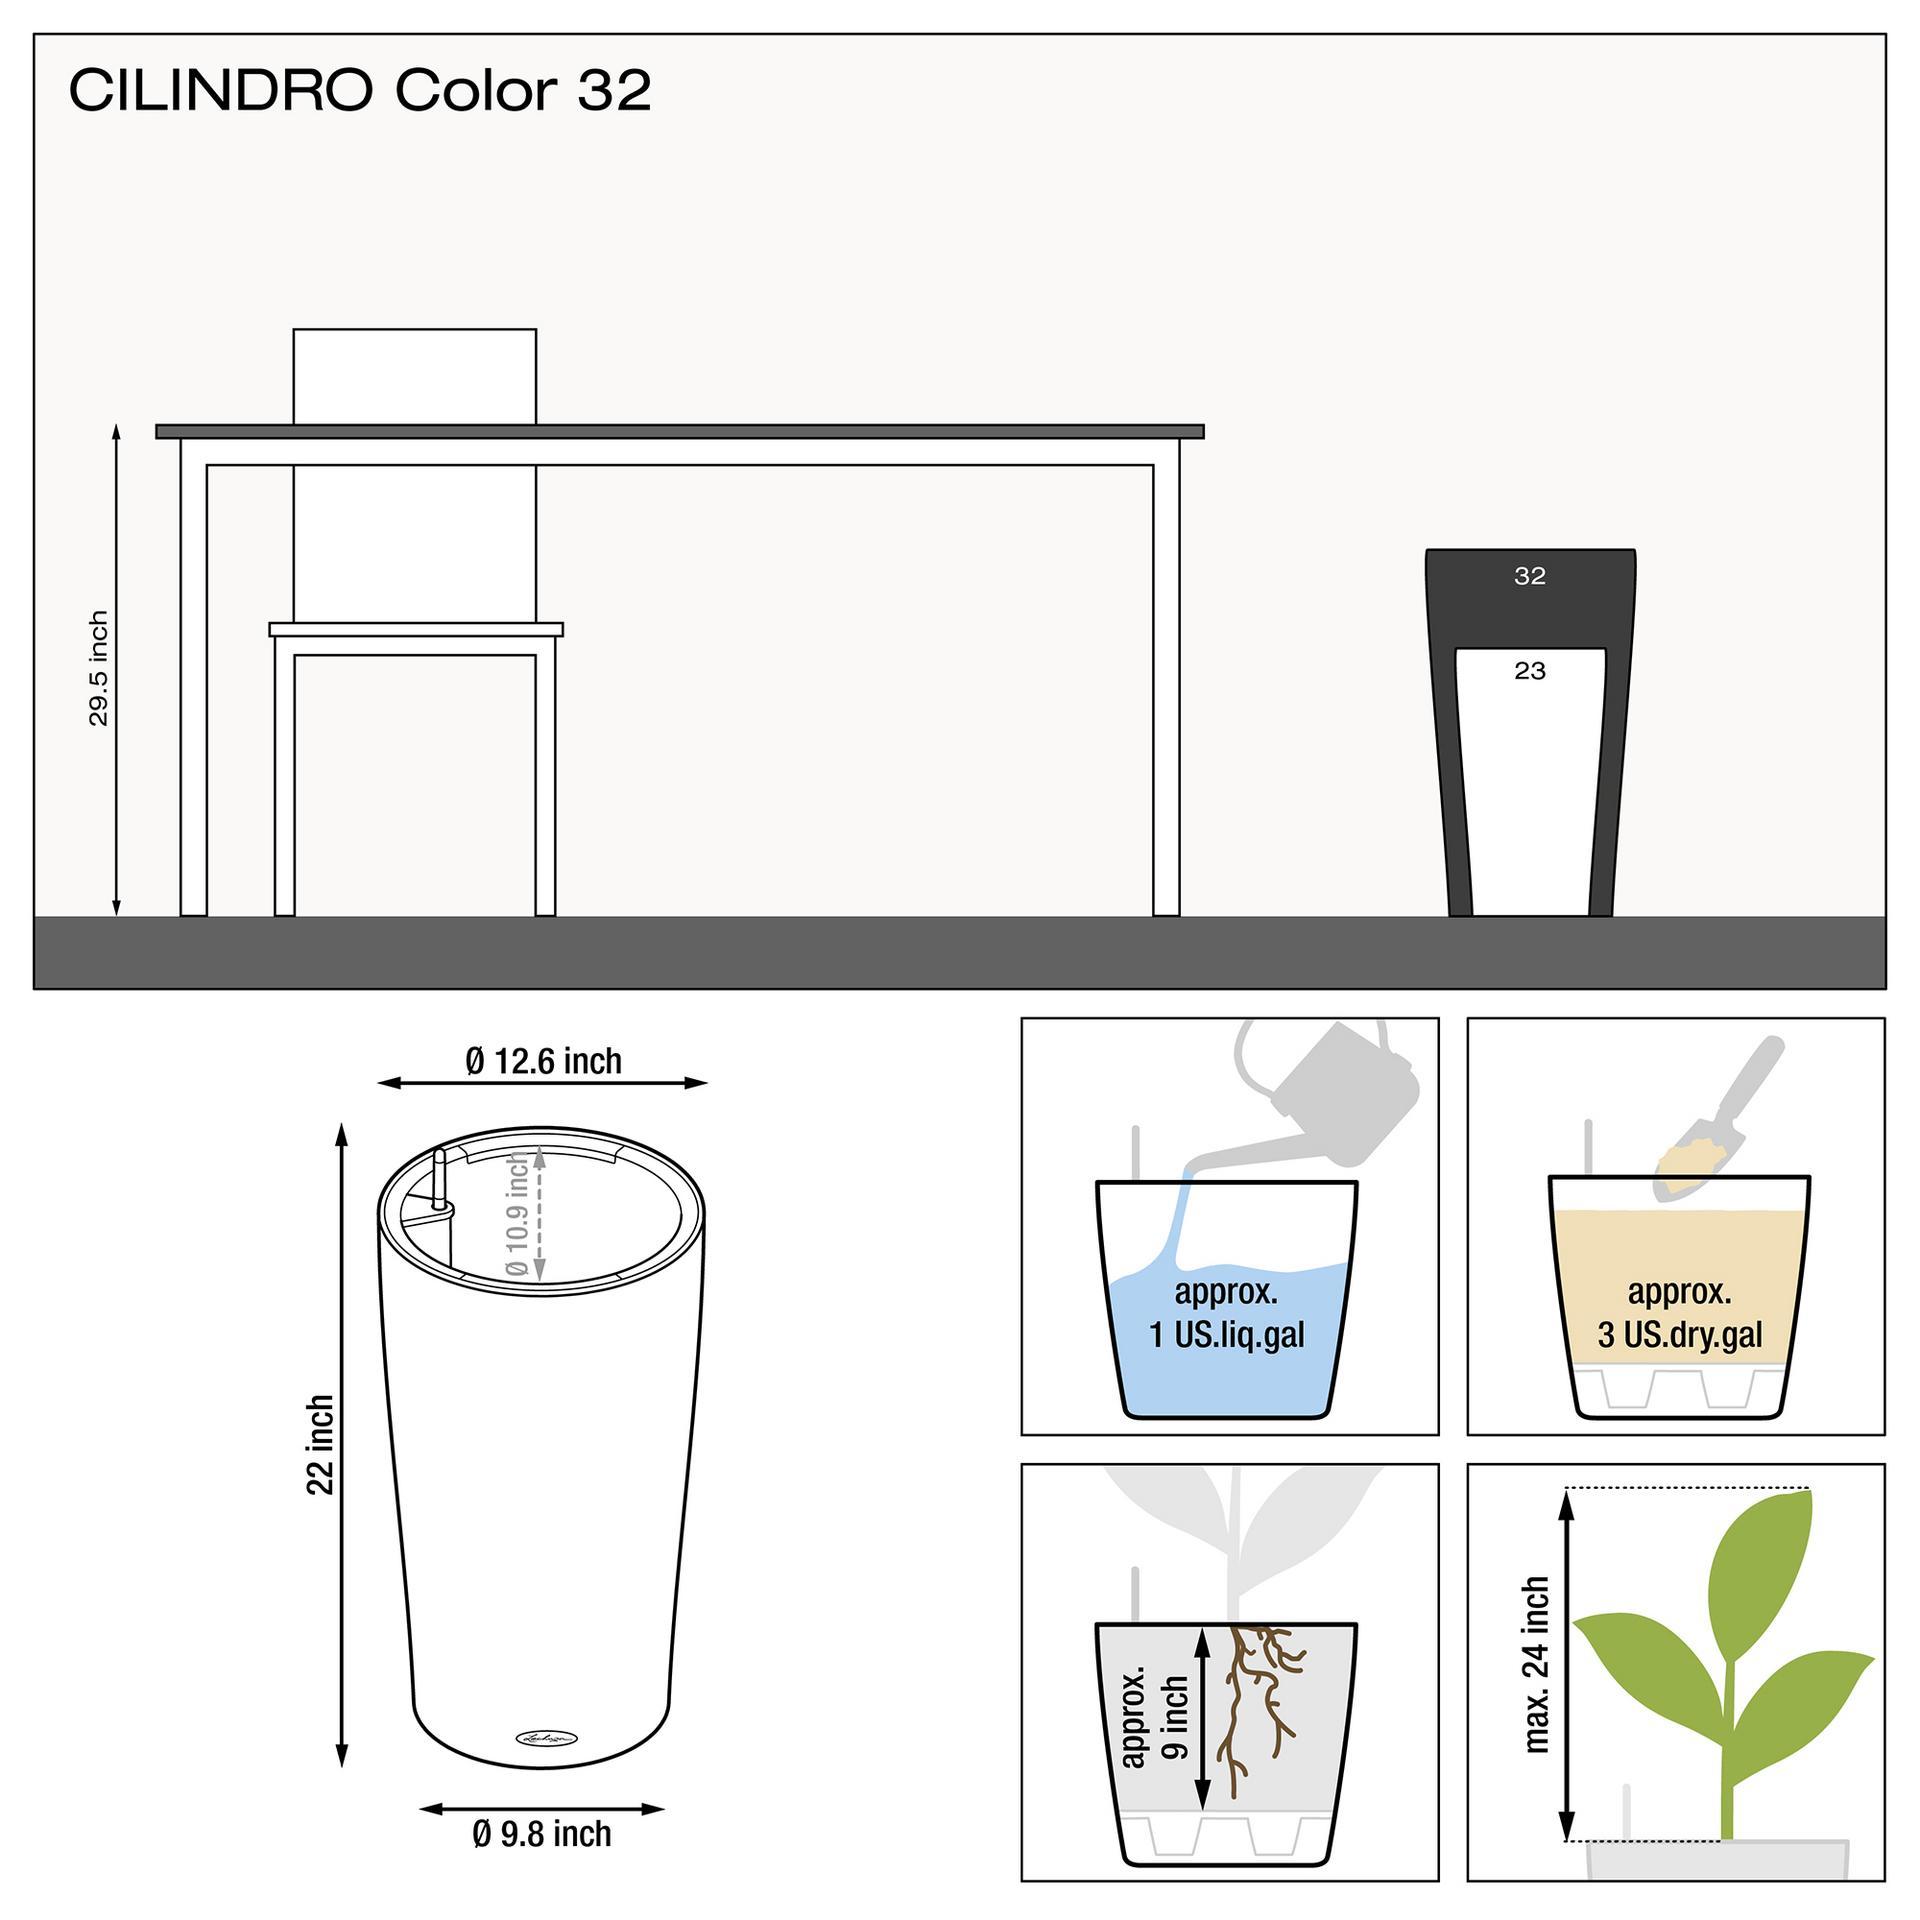 le_cilindro-color32_product_addi_nz_us